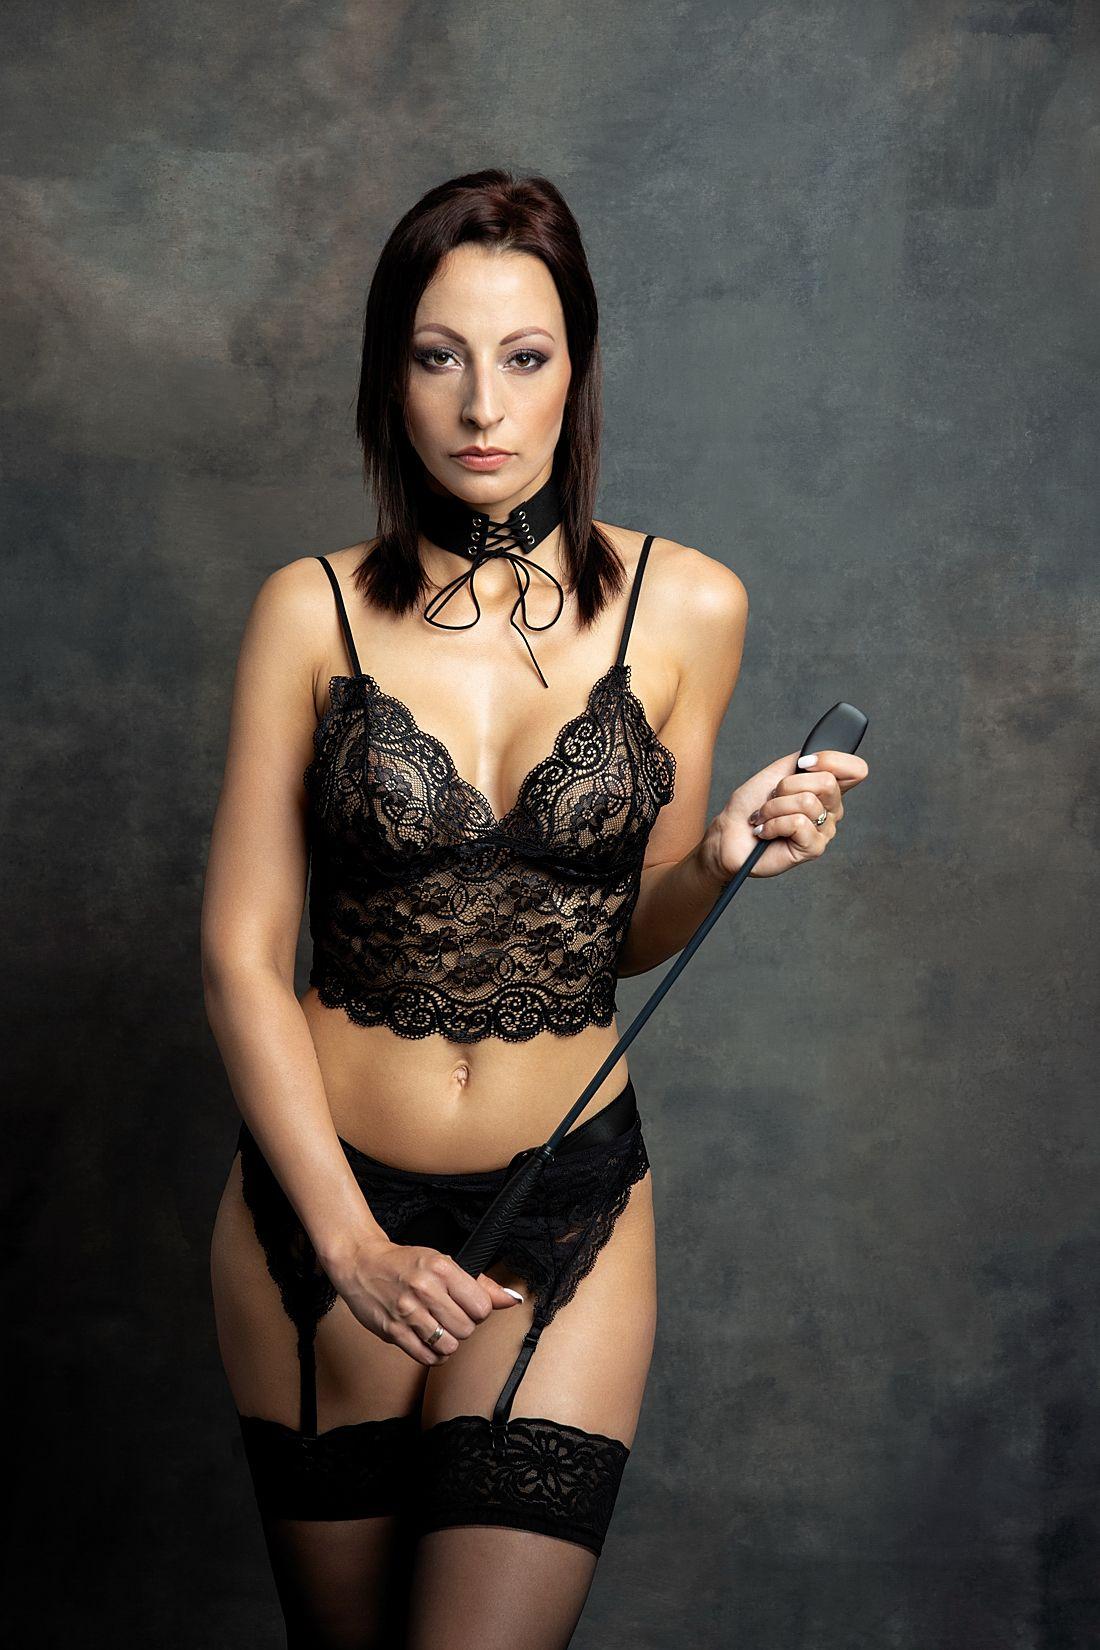 model, fine art, sexy, sensual, colour, woman, female, body, erotica, glamour, curves, portrait, beautiful, fashion, red lips, lingerie, bdsm,, Lajos Csáki